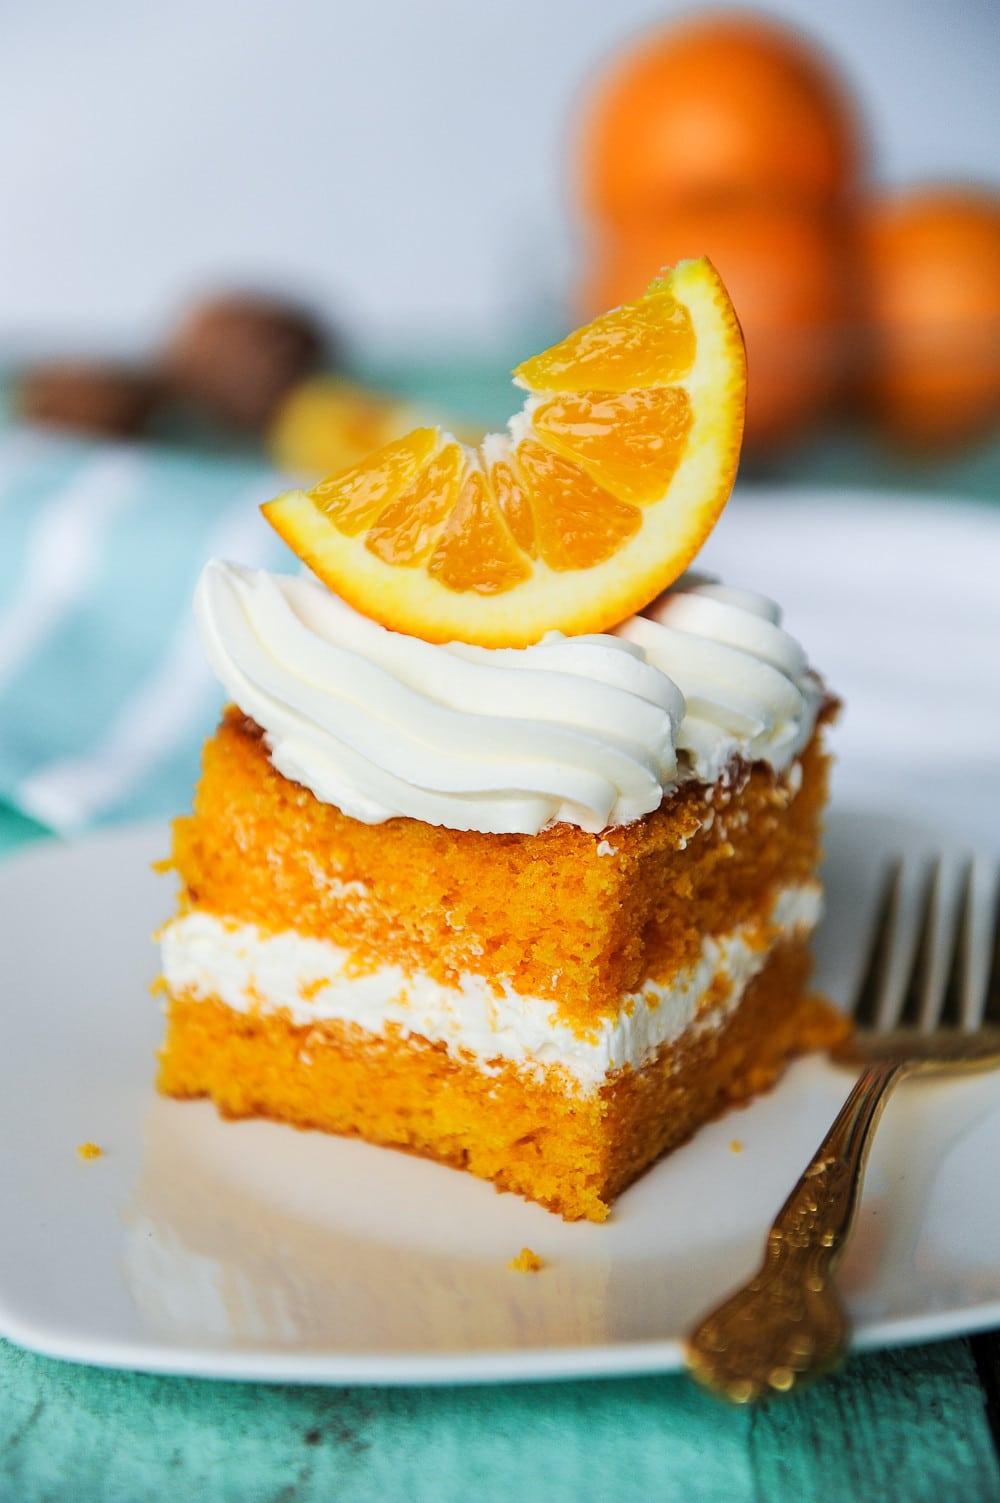 Orange Creamsicle Cake (from scratch) | Sugar Geek Show